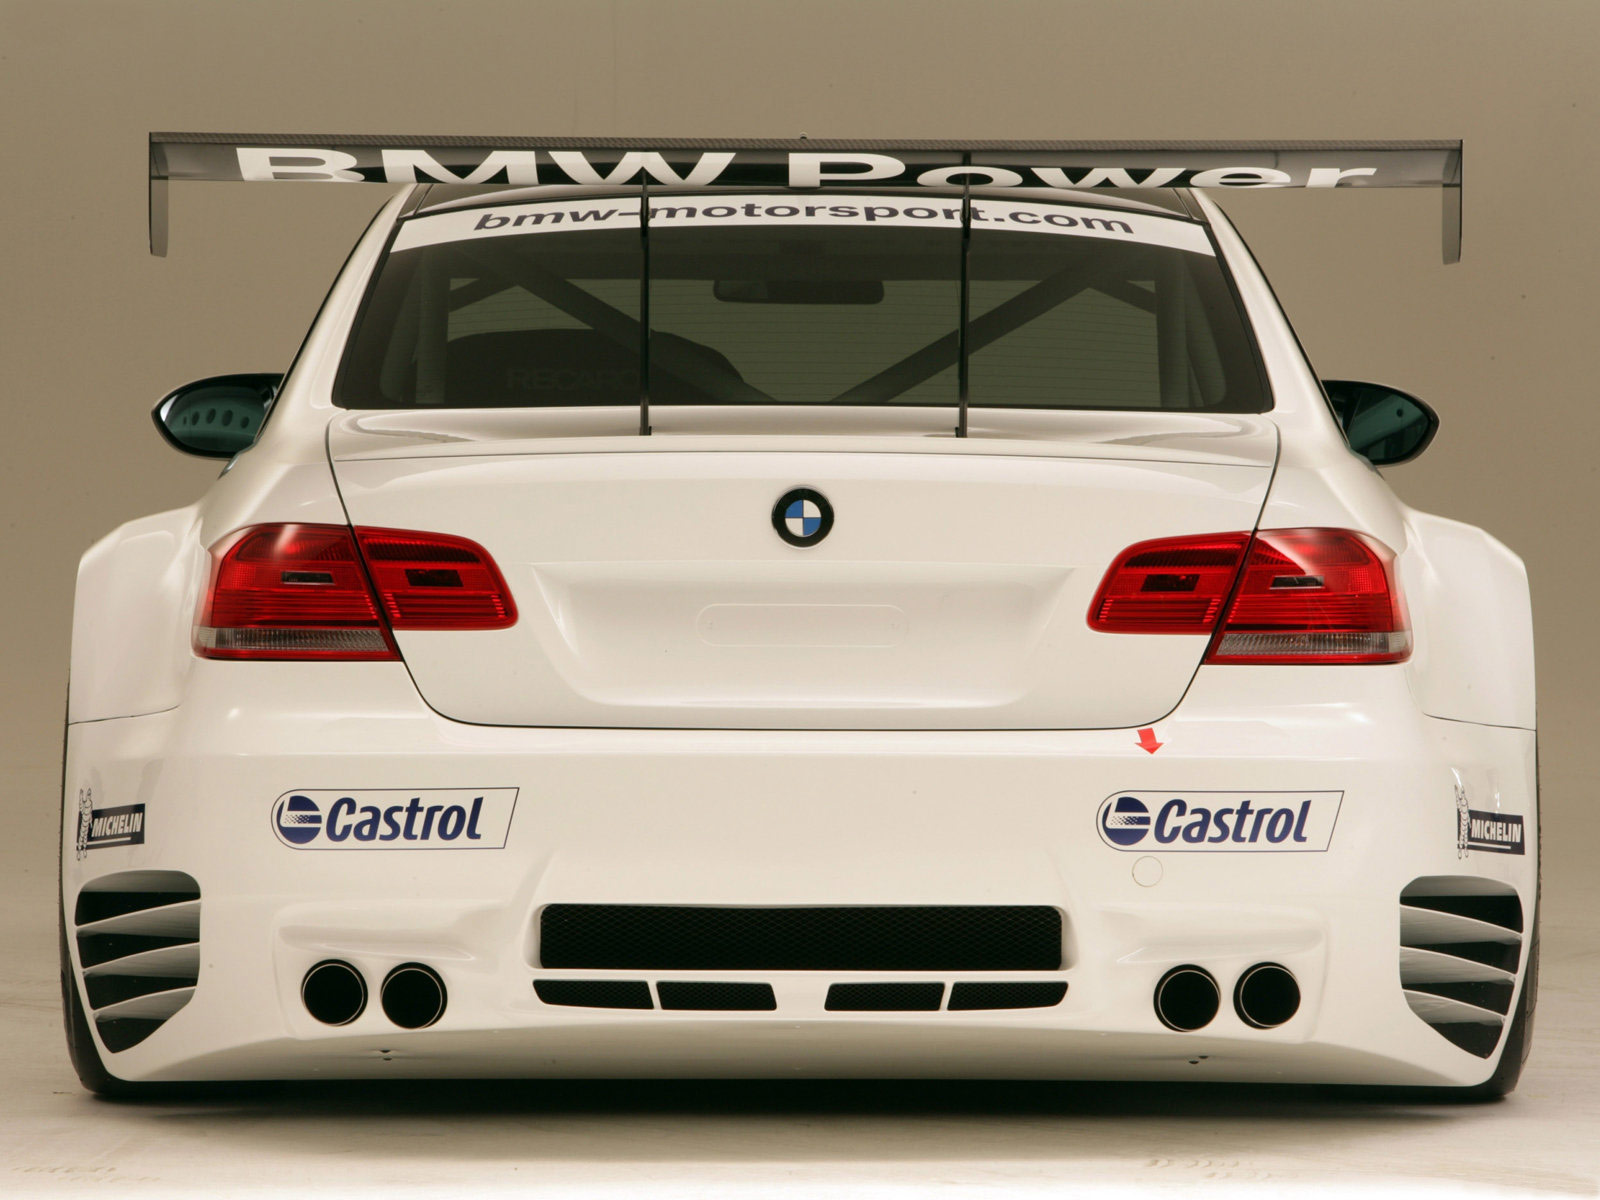 BMW M GTR Race Car